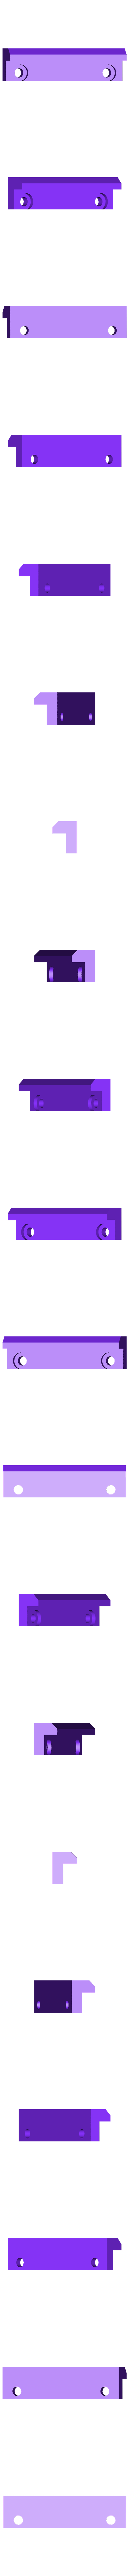 X210LiPoLock_rear.stl Download free STL file QAV-X 210 X210 LiPo battery protector • 3D printer object, nik101968